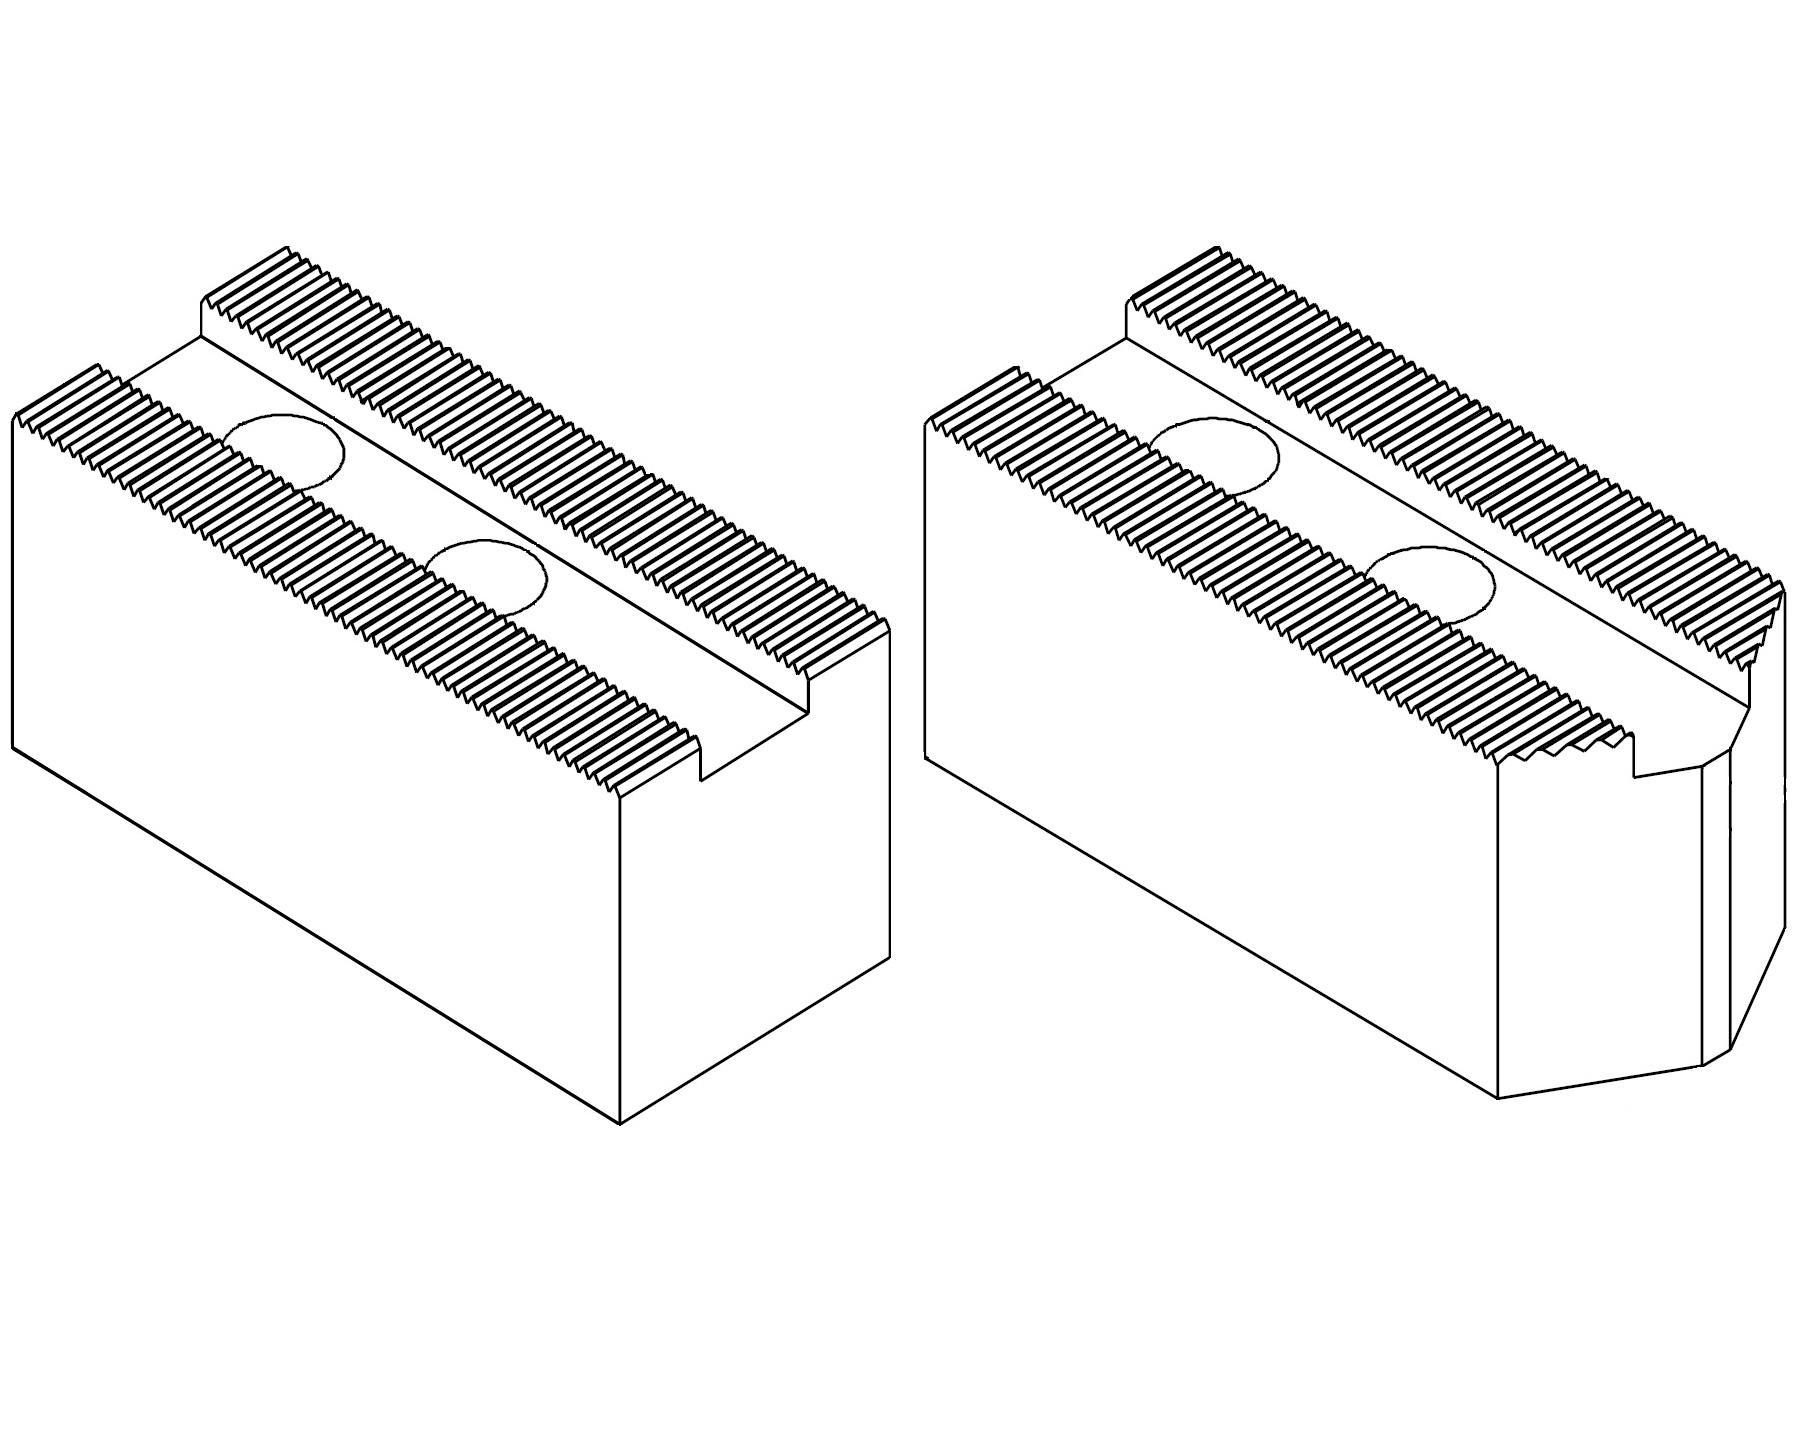 "Čelisti měkké 3/32""x90°, šířka drážky - 20 (sklíčidla BERG KH 400,500,630)"